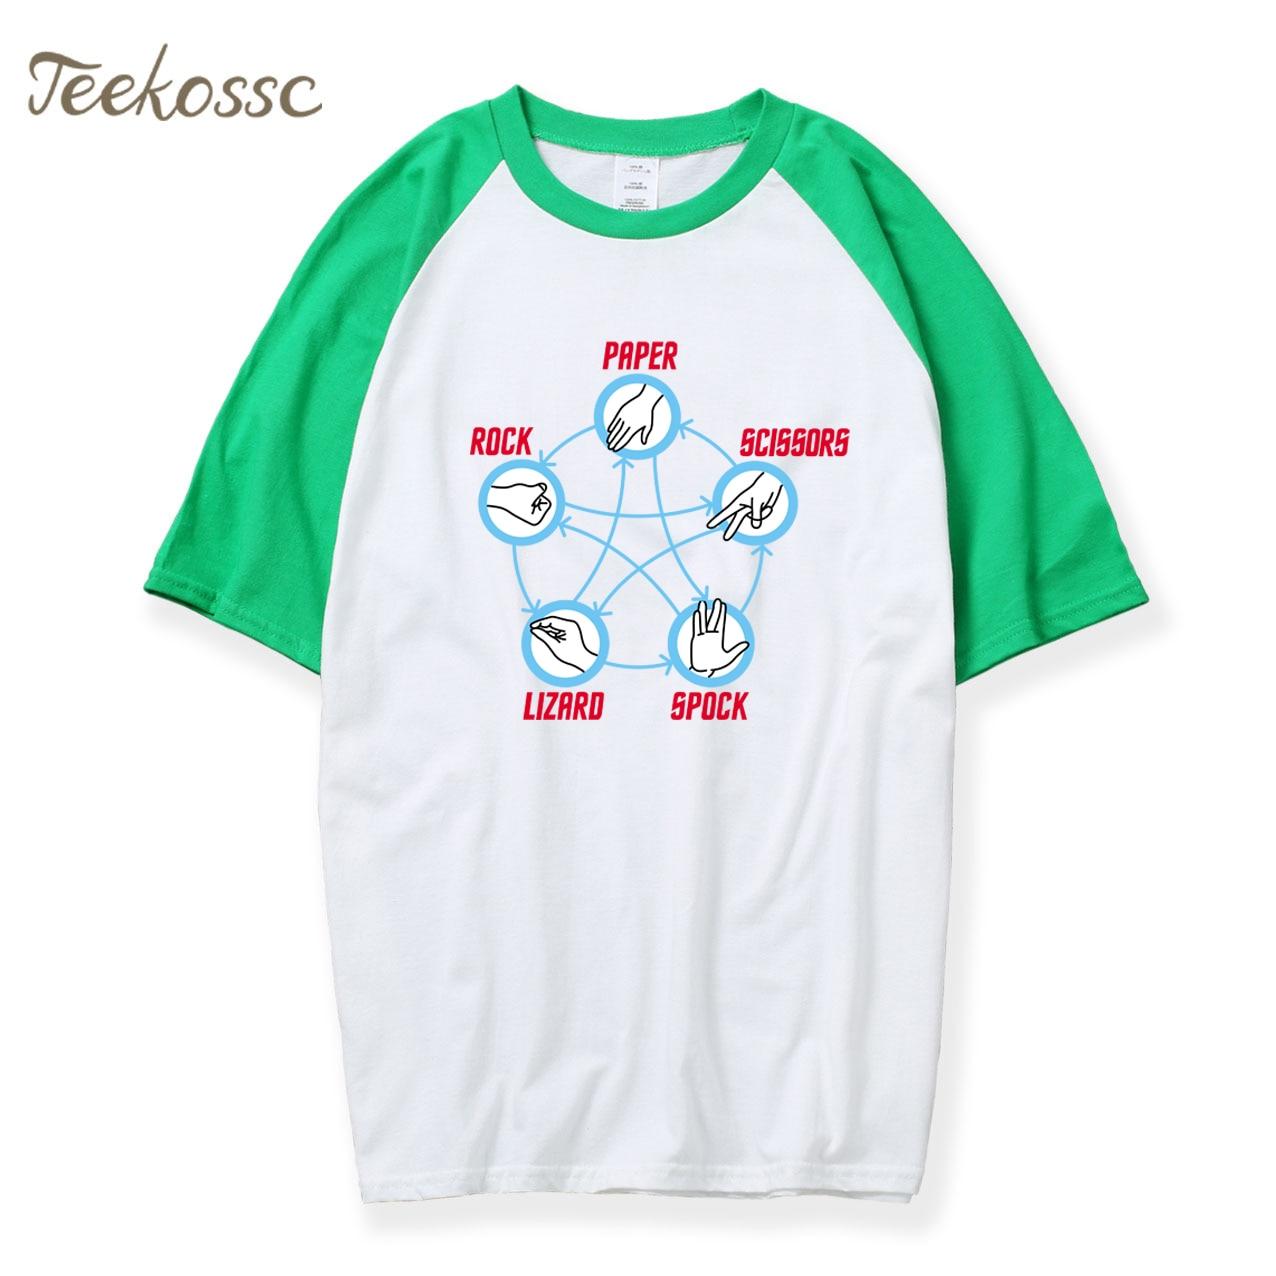 The Big Bang Theory T Shirt Men Rock Paper Scissors Lizard Spock T-Shirt 2018 Hot Summer Raglan Tshirt Cotton Mens TV Shirts Top